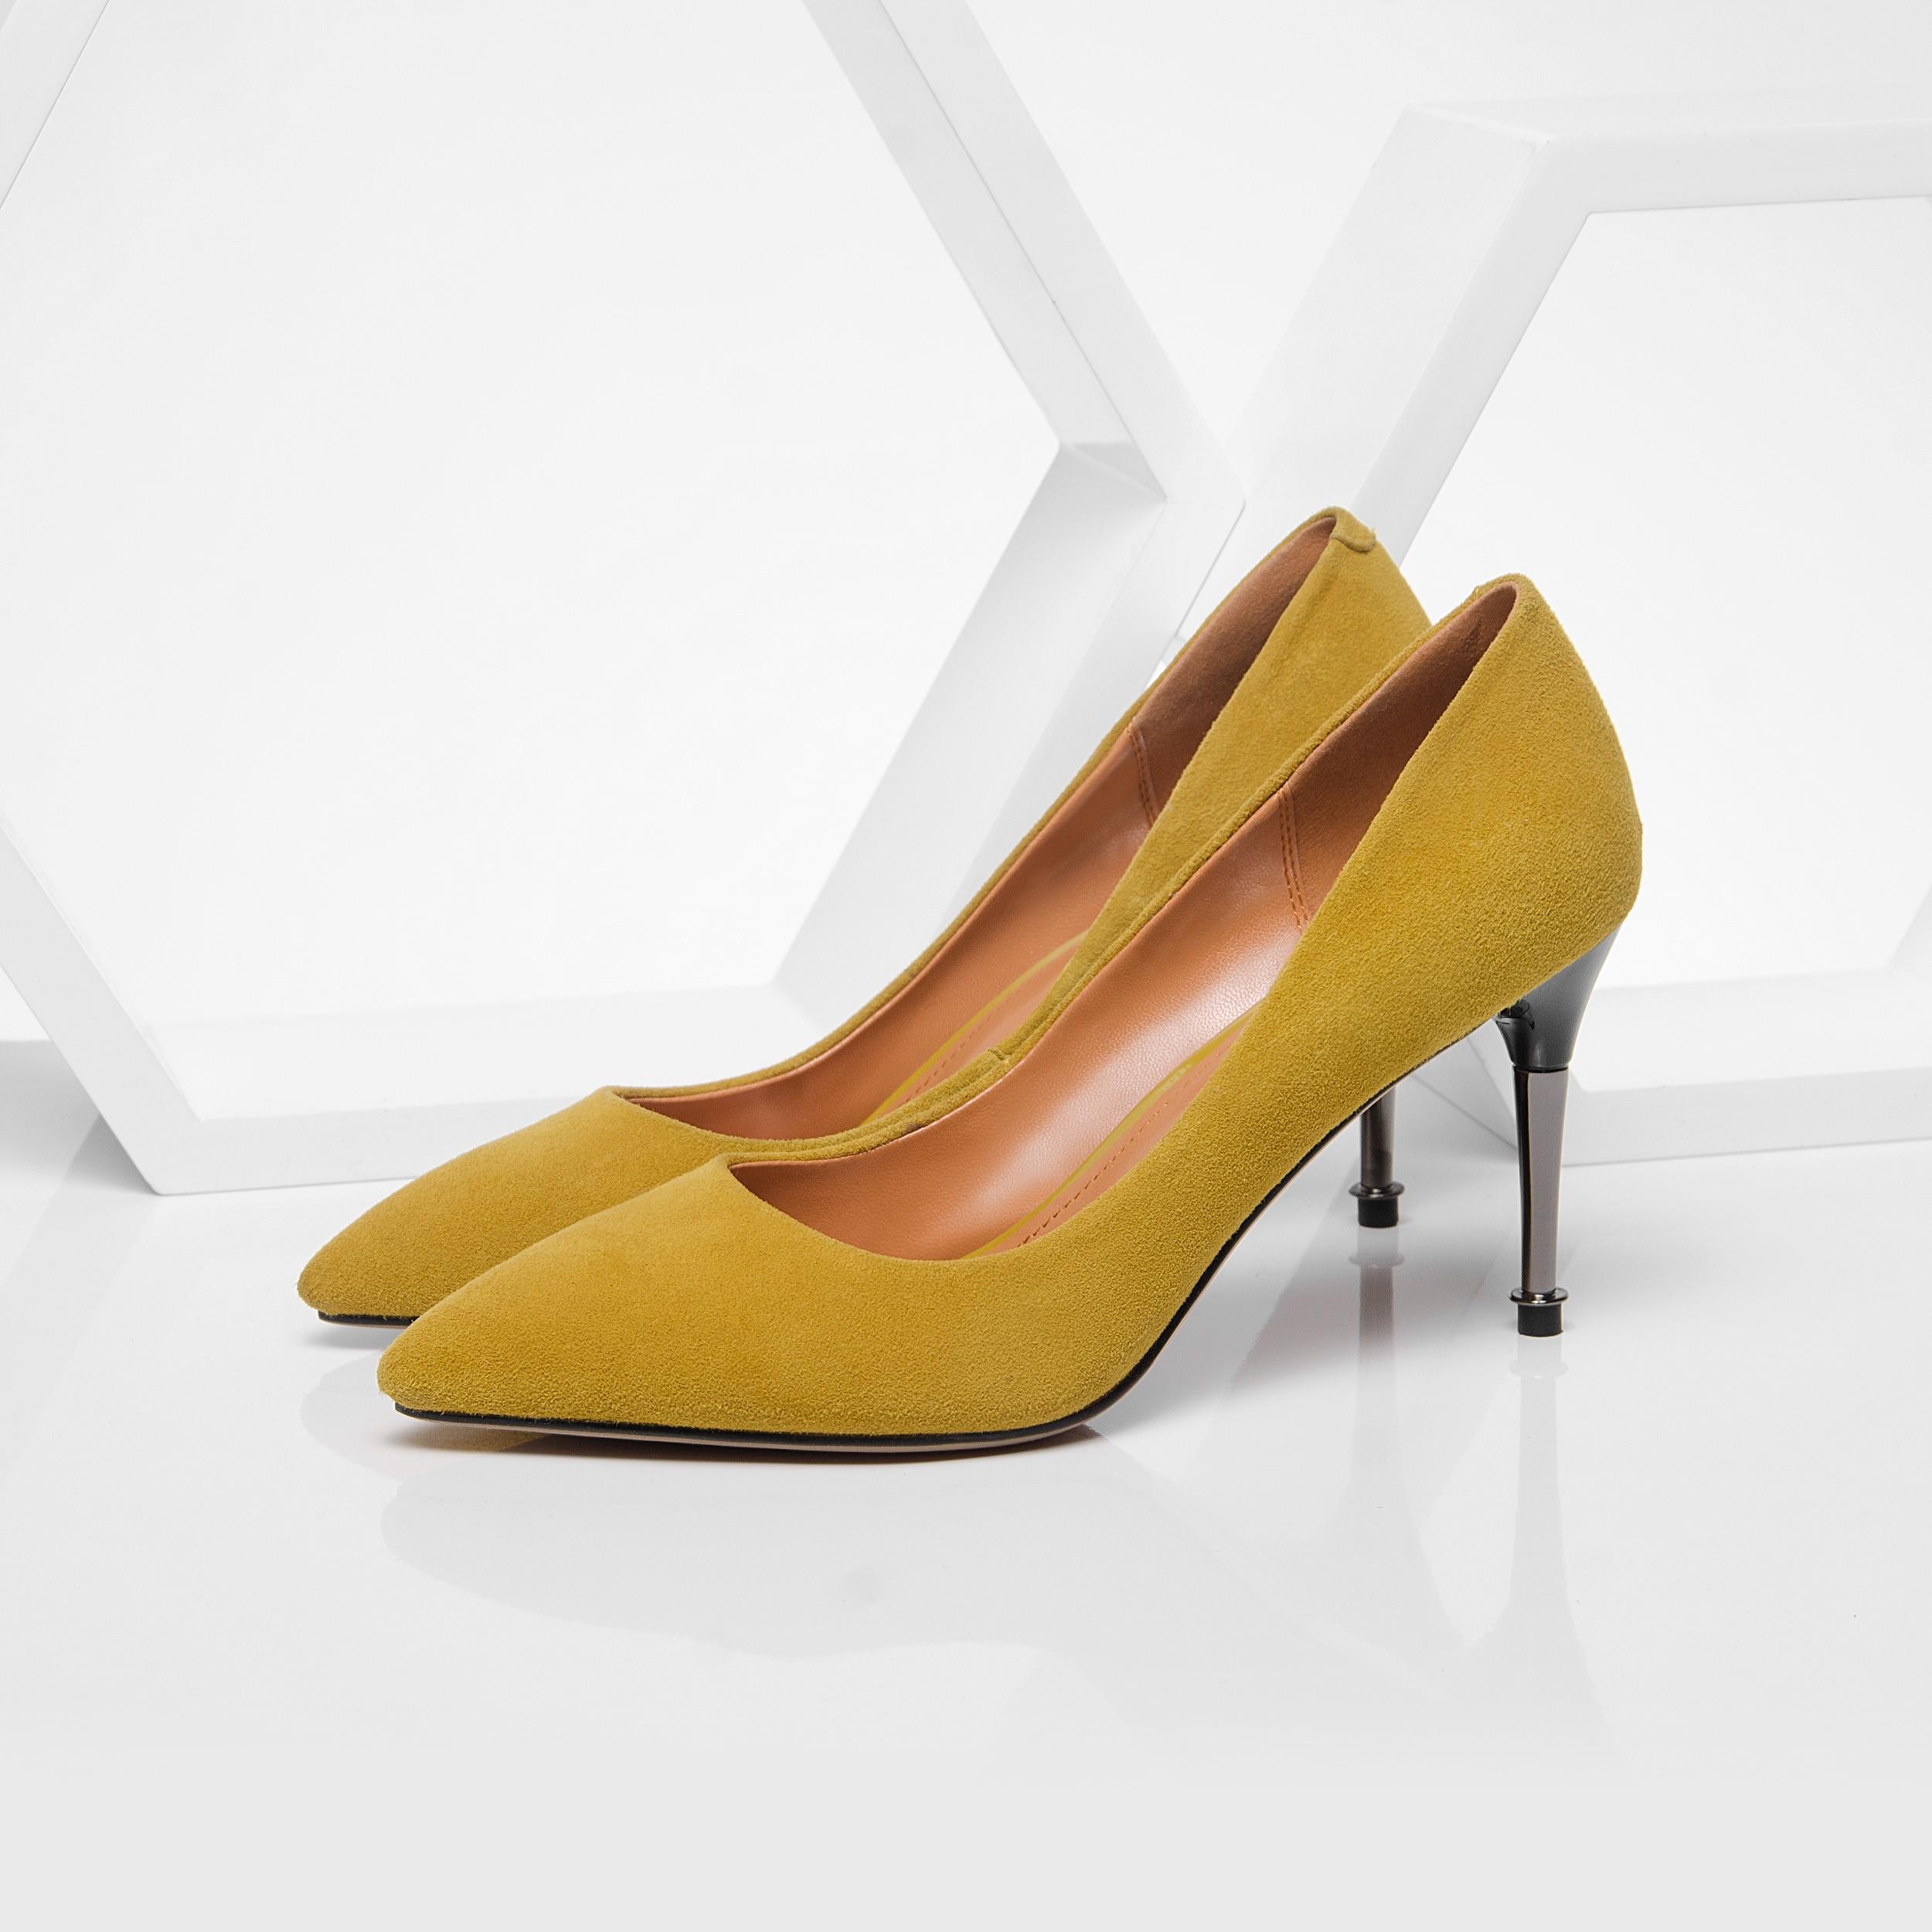 Cuero Fina Alto amarillo Gamuza Tacón Cm Para Mujer Chico 5 2019 Negro Zapatos De Sexy Verano 8 Primavera wTXzzqRn0